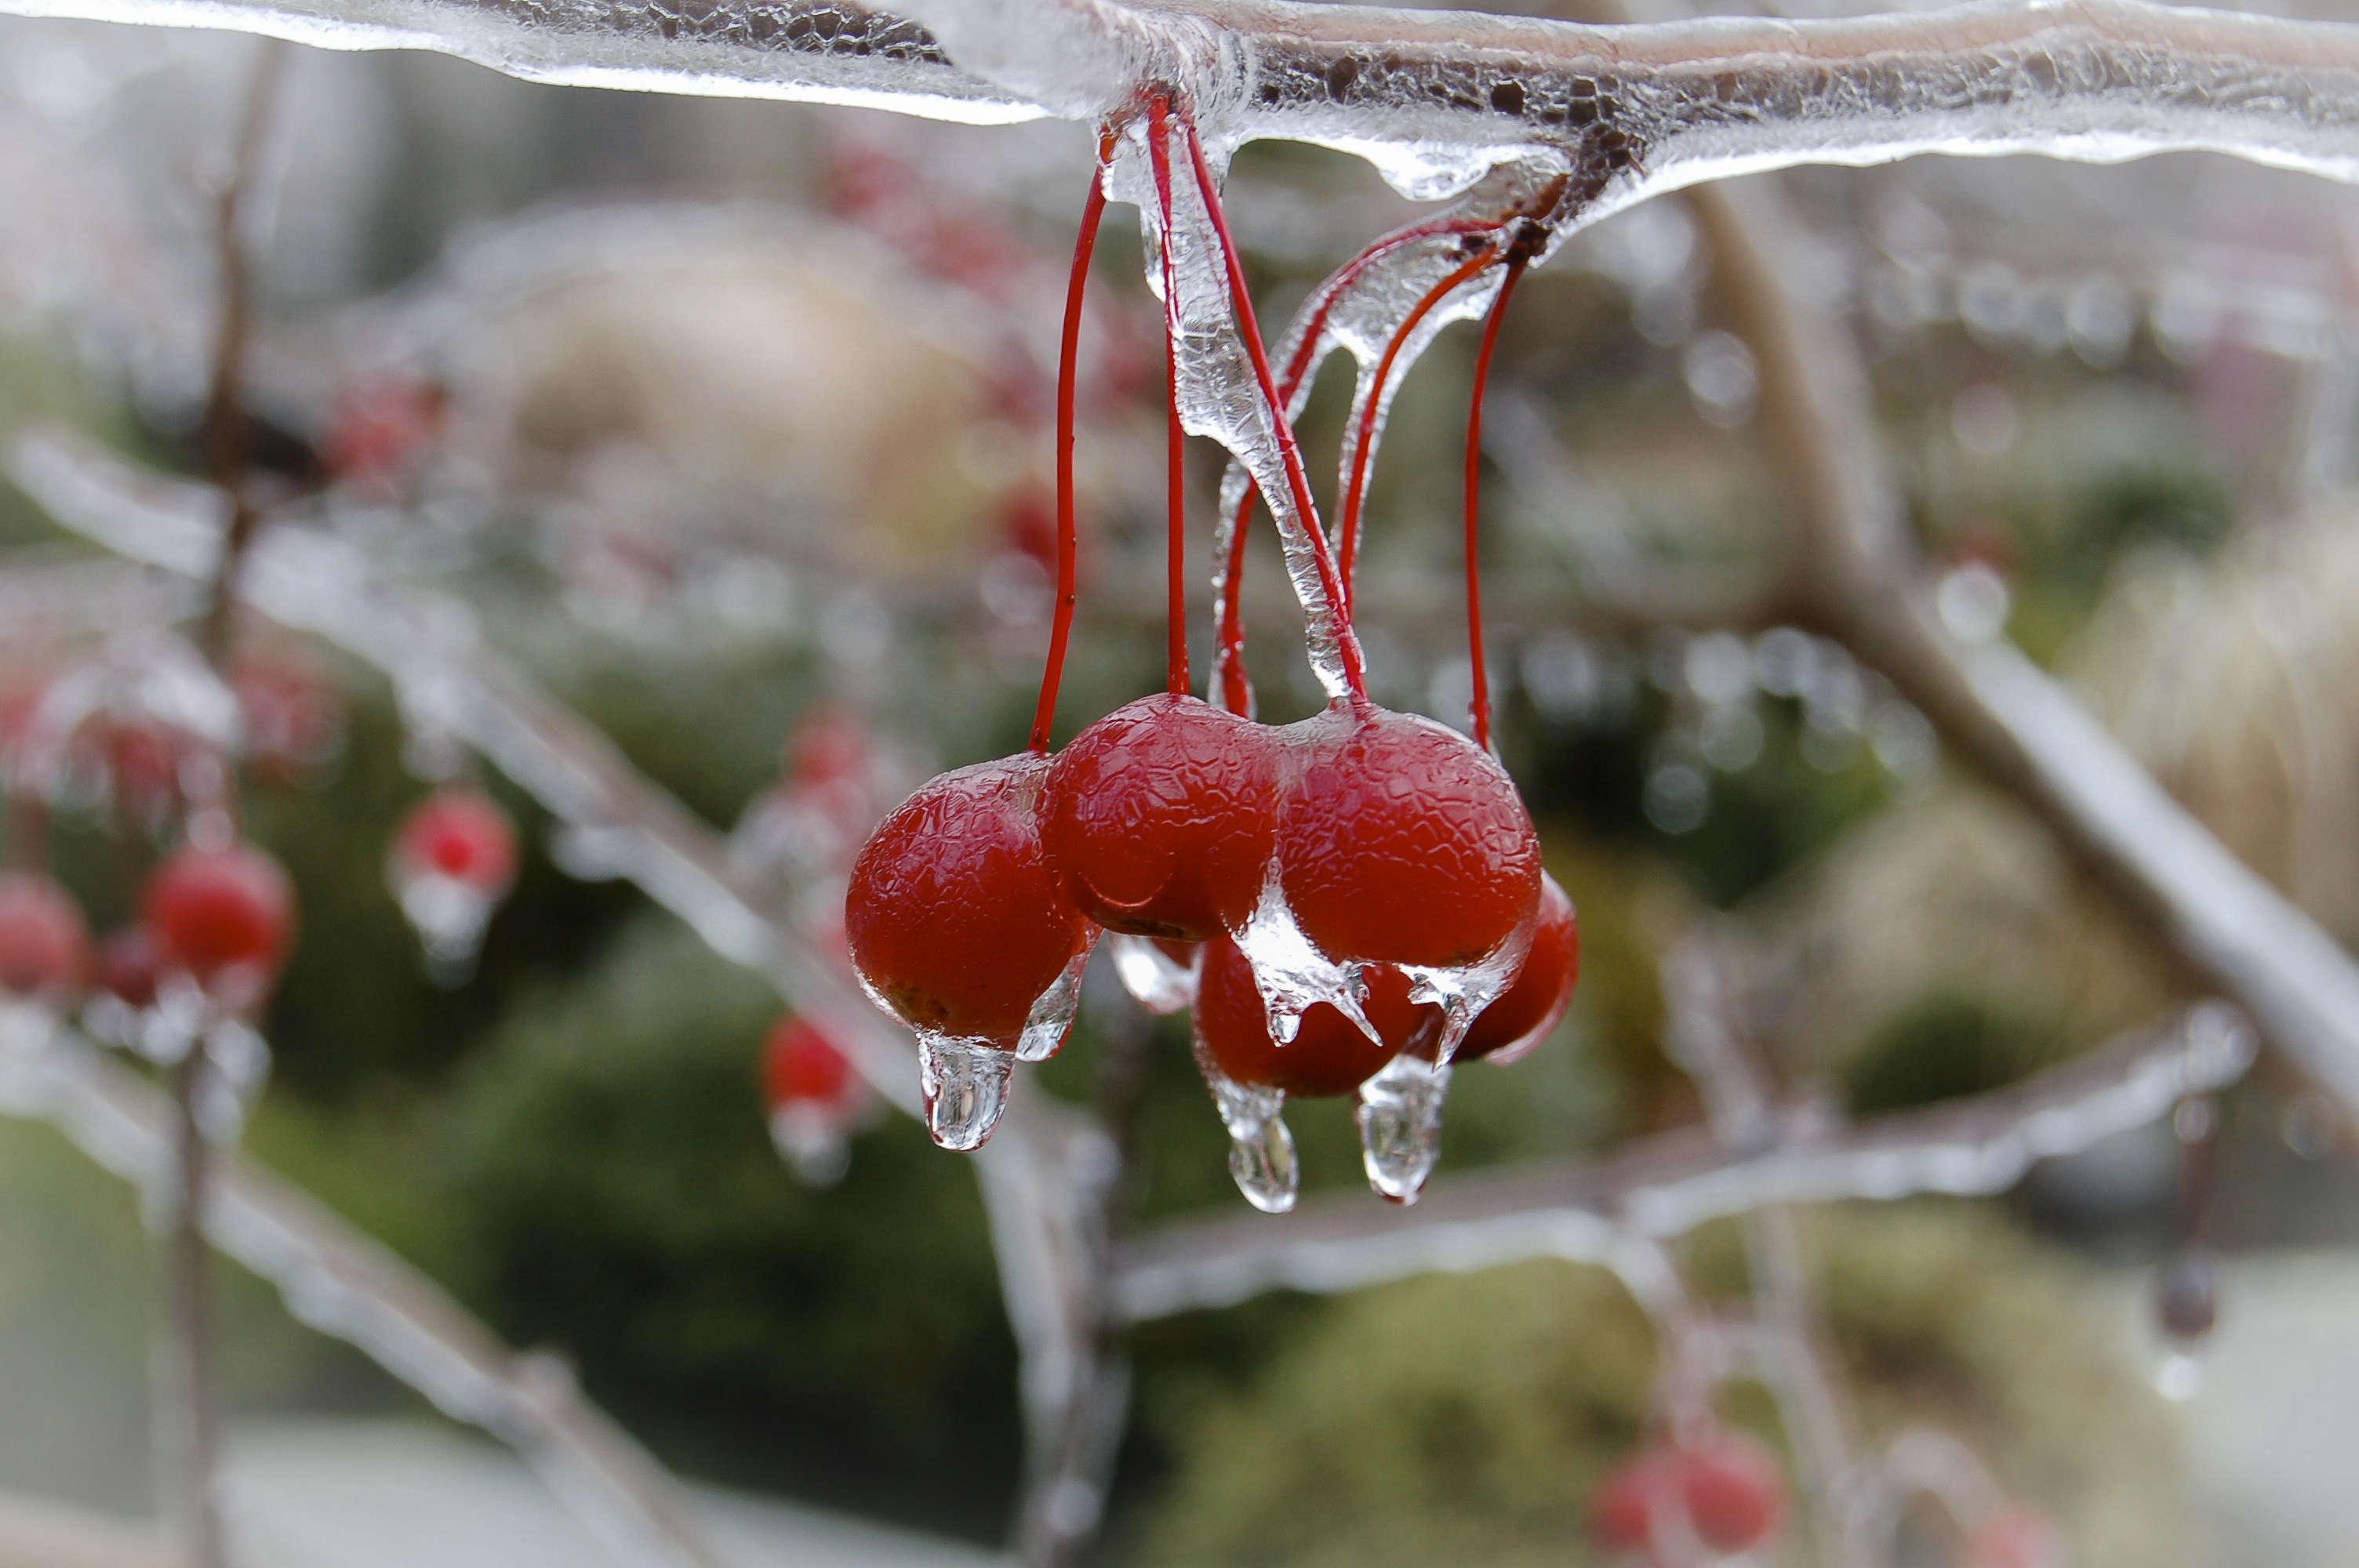 juniper-hill-winter-garden-joseph-valentine-2